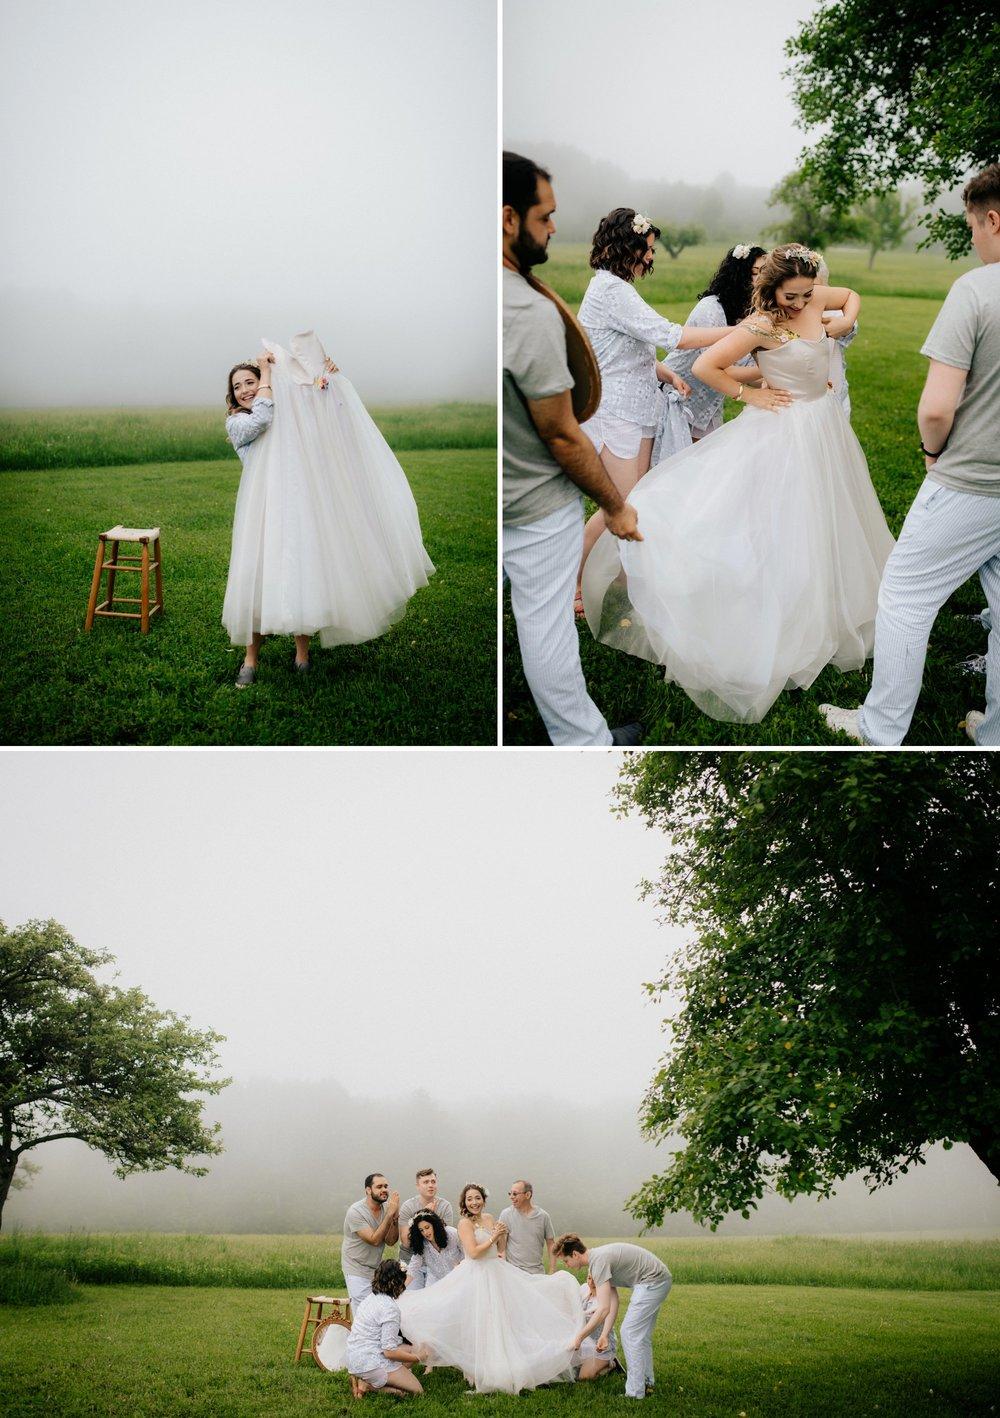 Fiddle Lake Farm Philadelphia Pennsylvania Misty Rustic Wedding with Lush Florals Foggy Outdoor Bridal prep